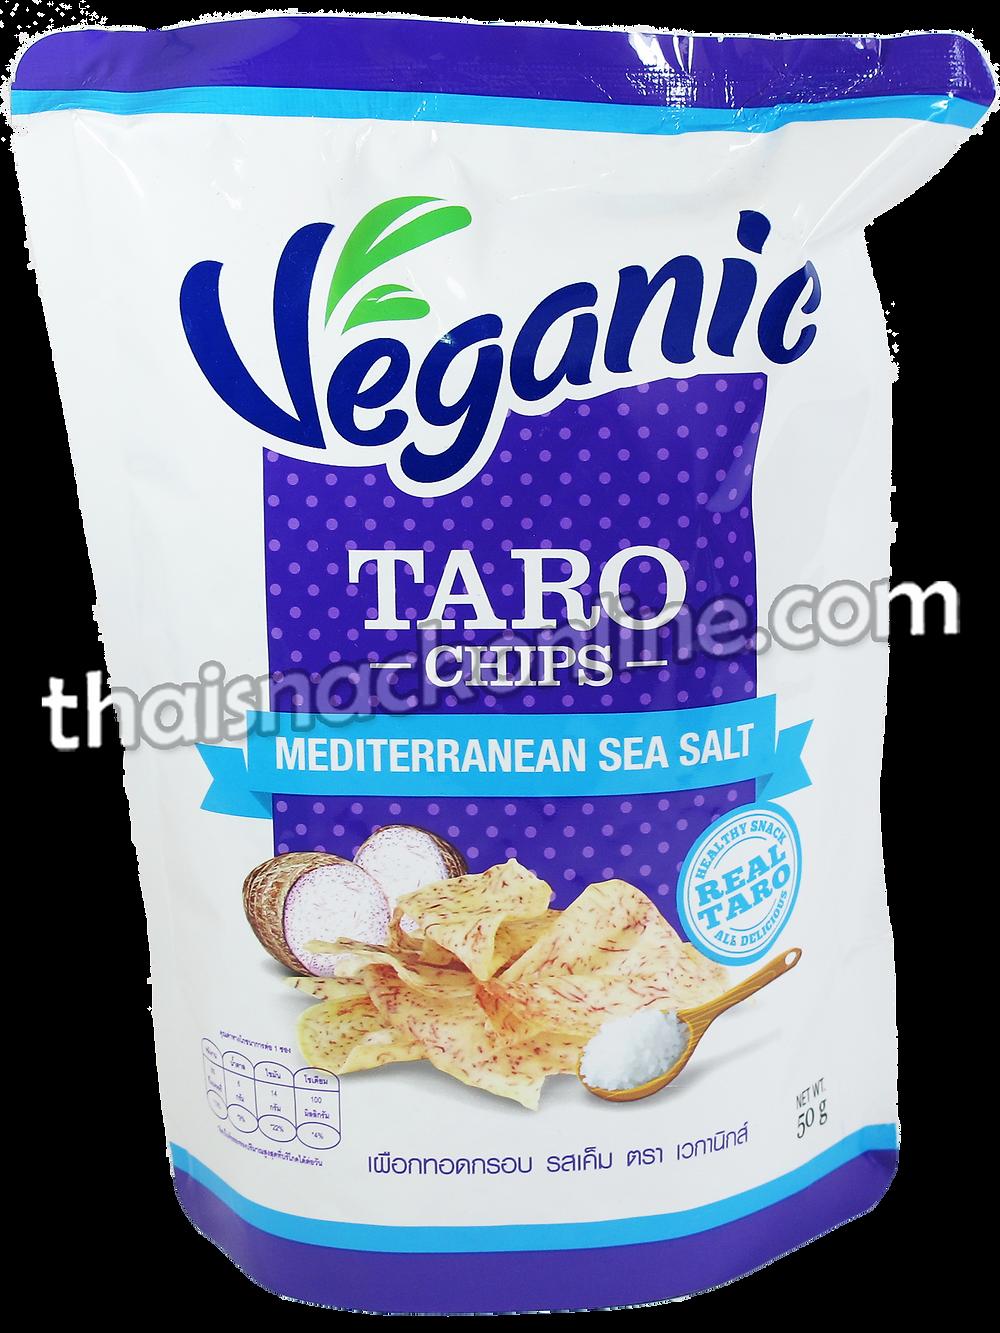 Veganic - Taro Chips Mediterranean Sea Salt